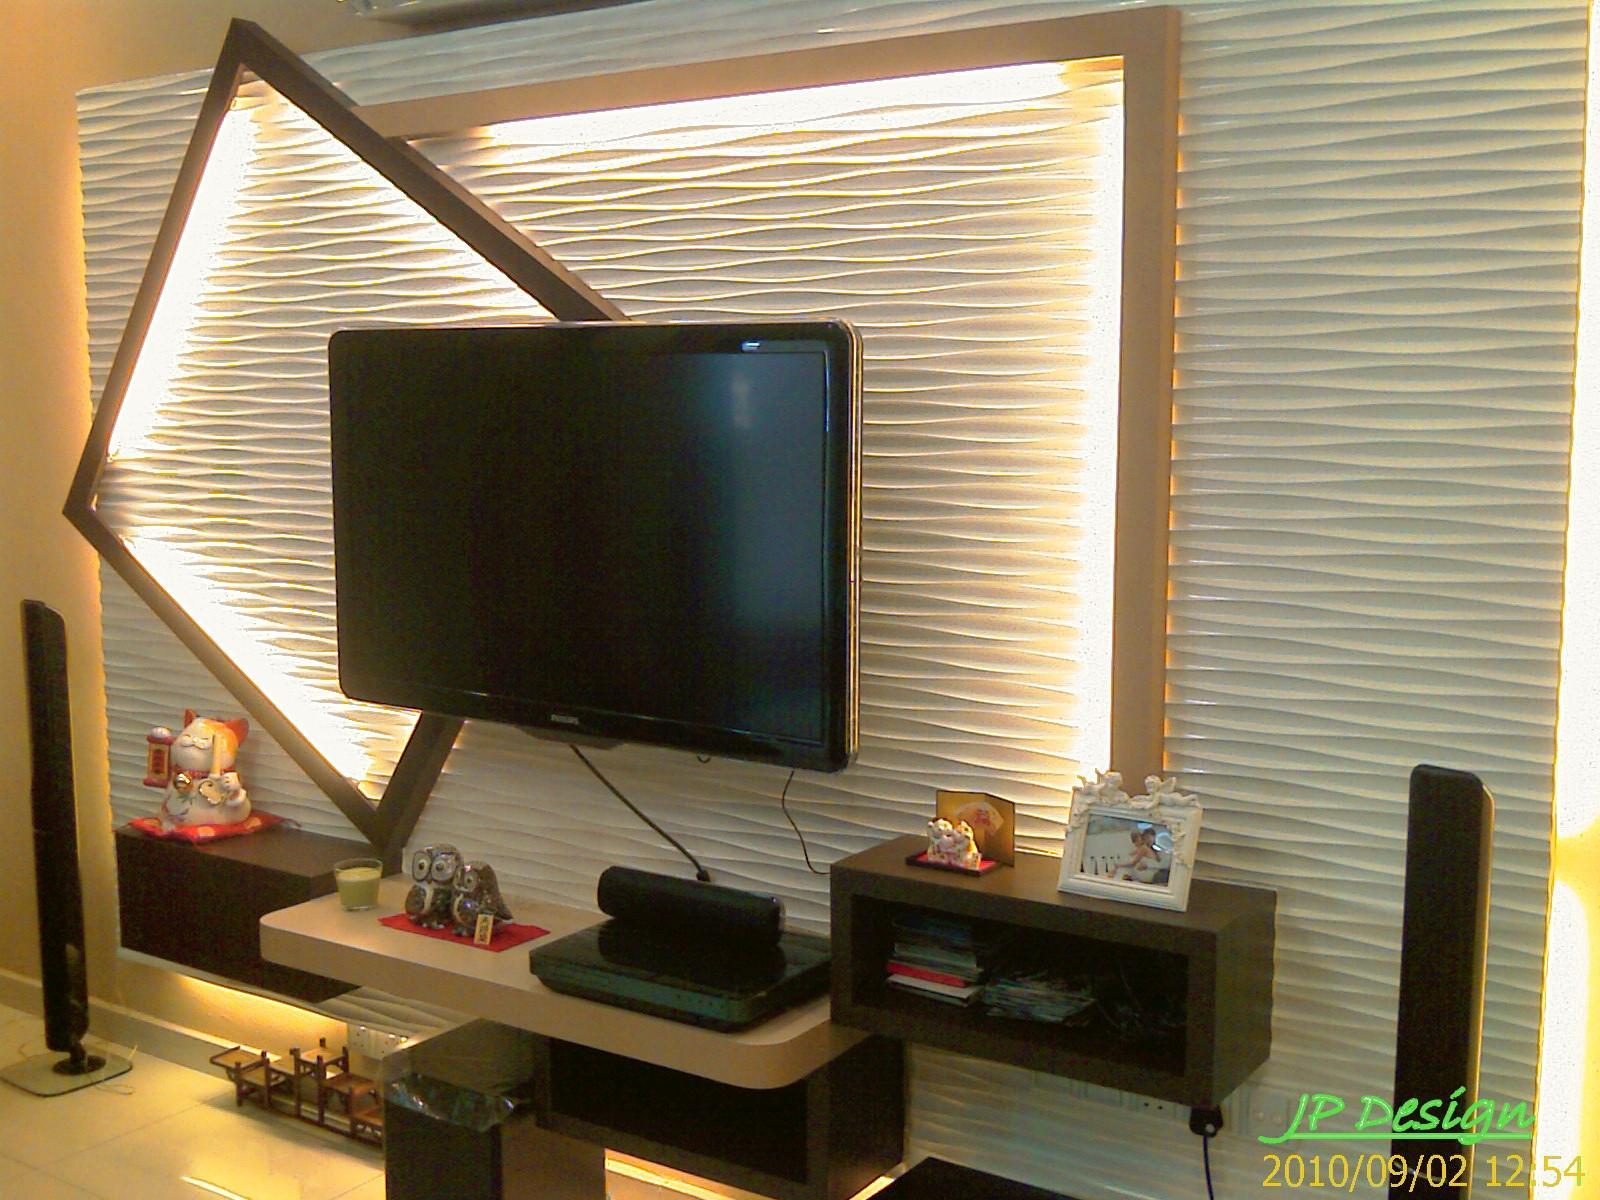 Kl custom cabinets